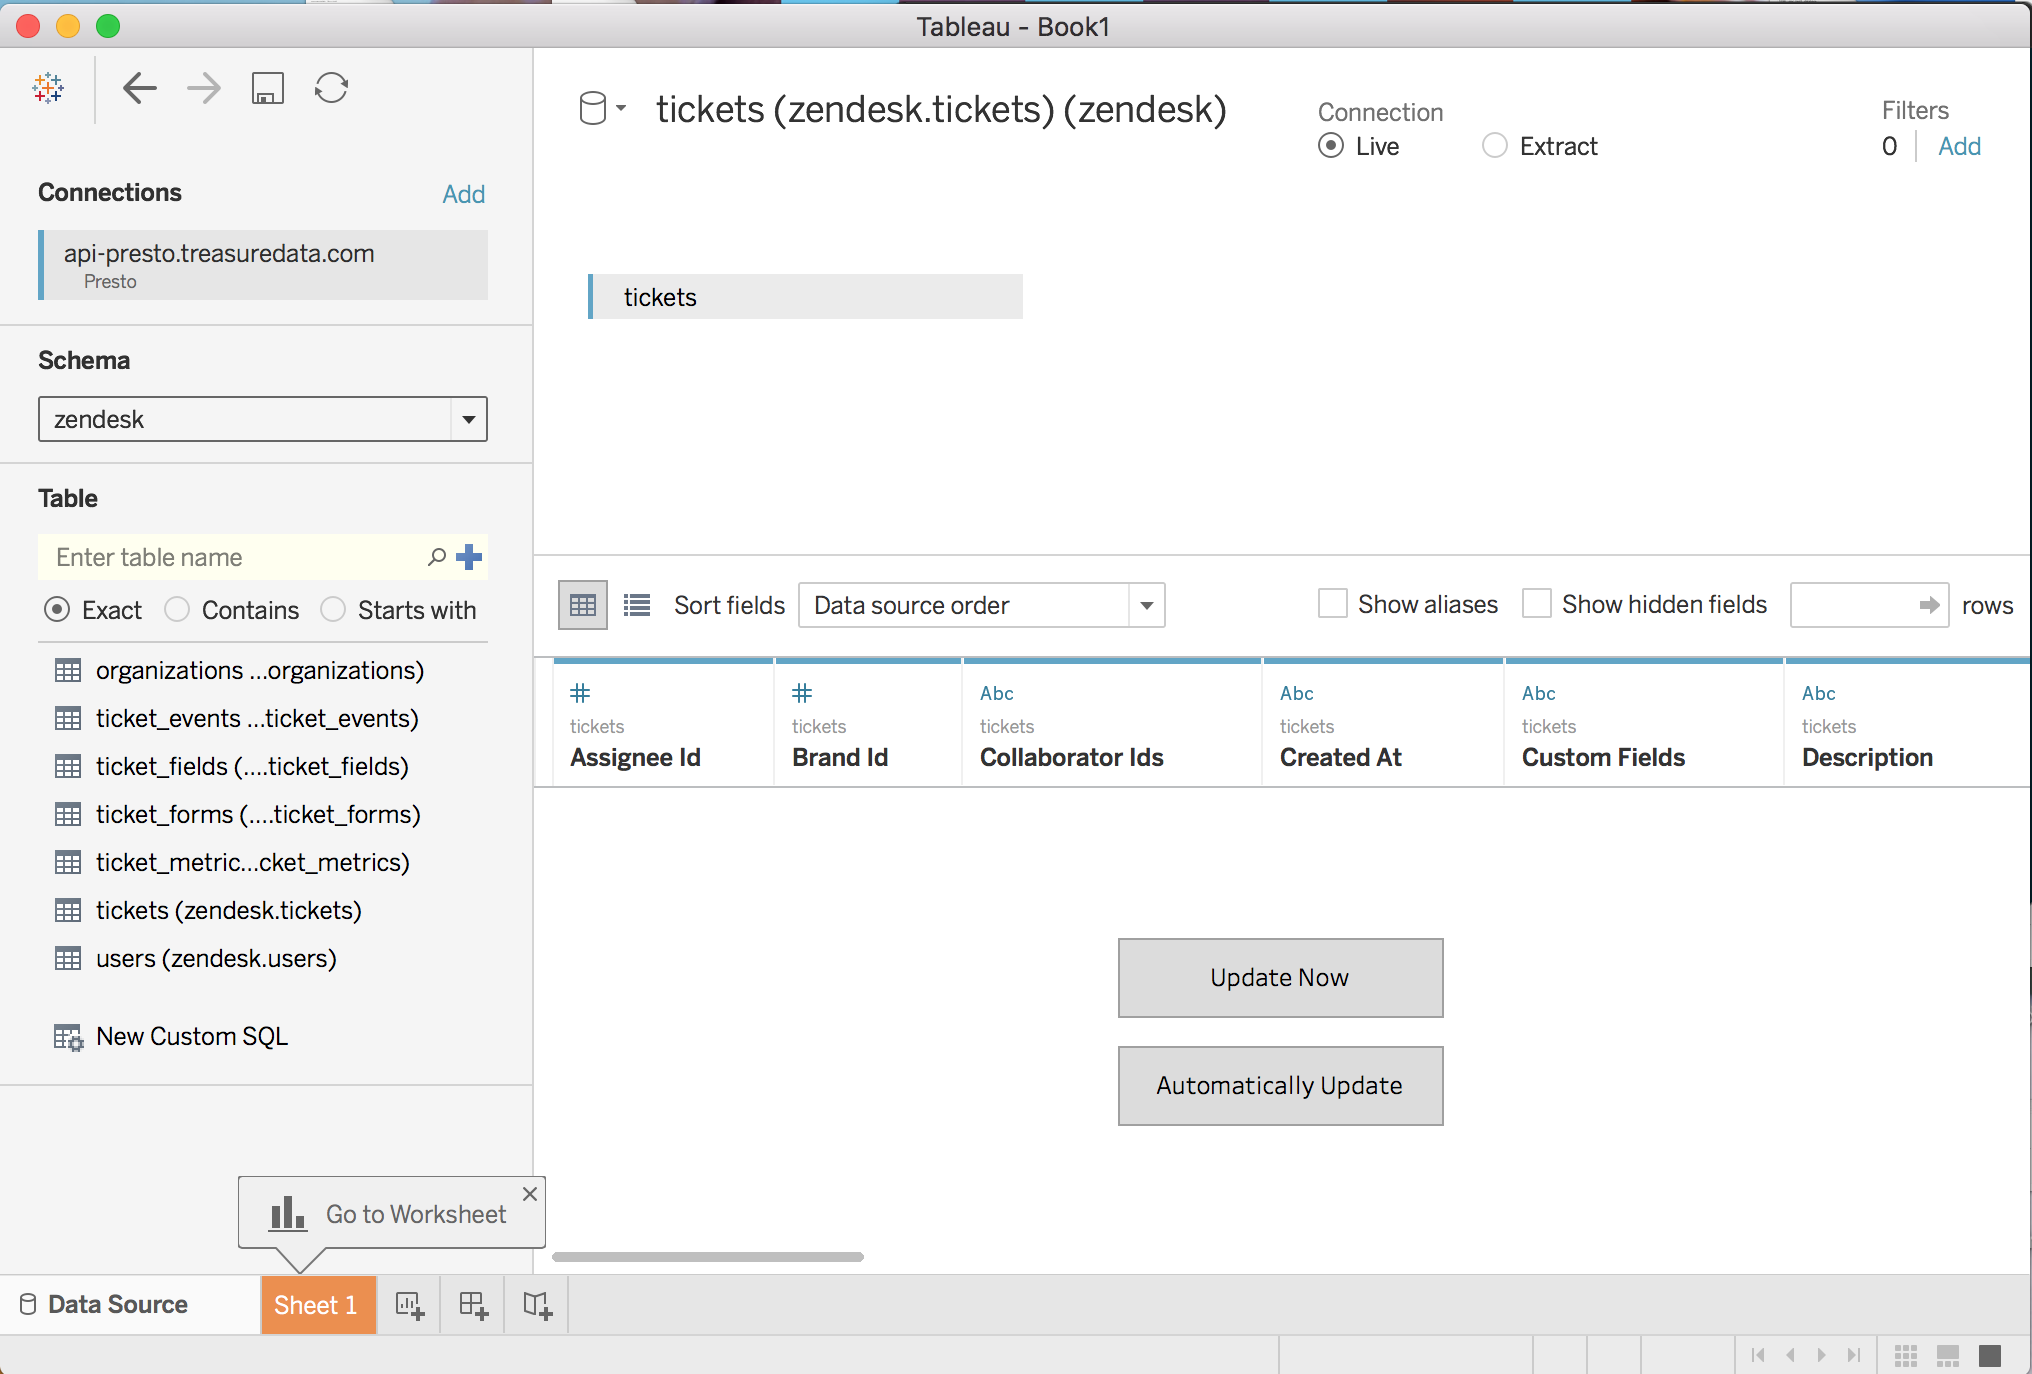 Microsoft Access Database Driver For Tableau Mac - swingderka's blog